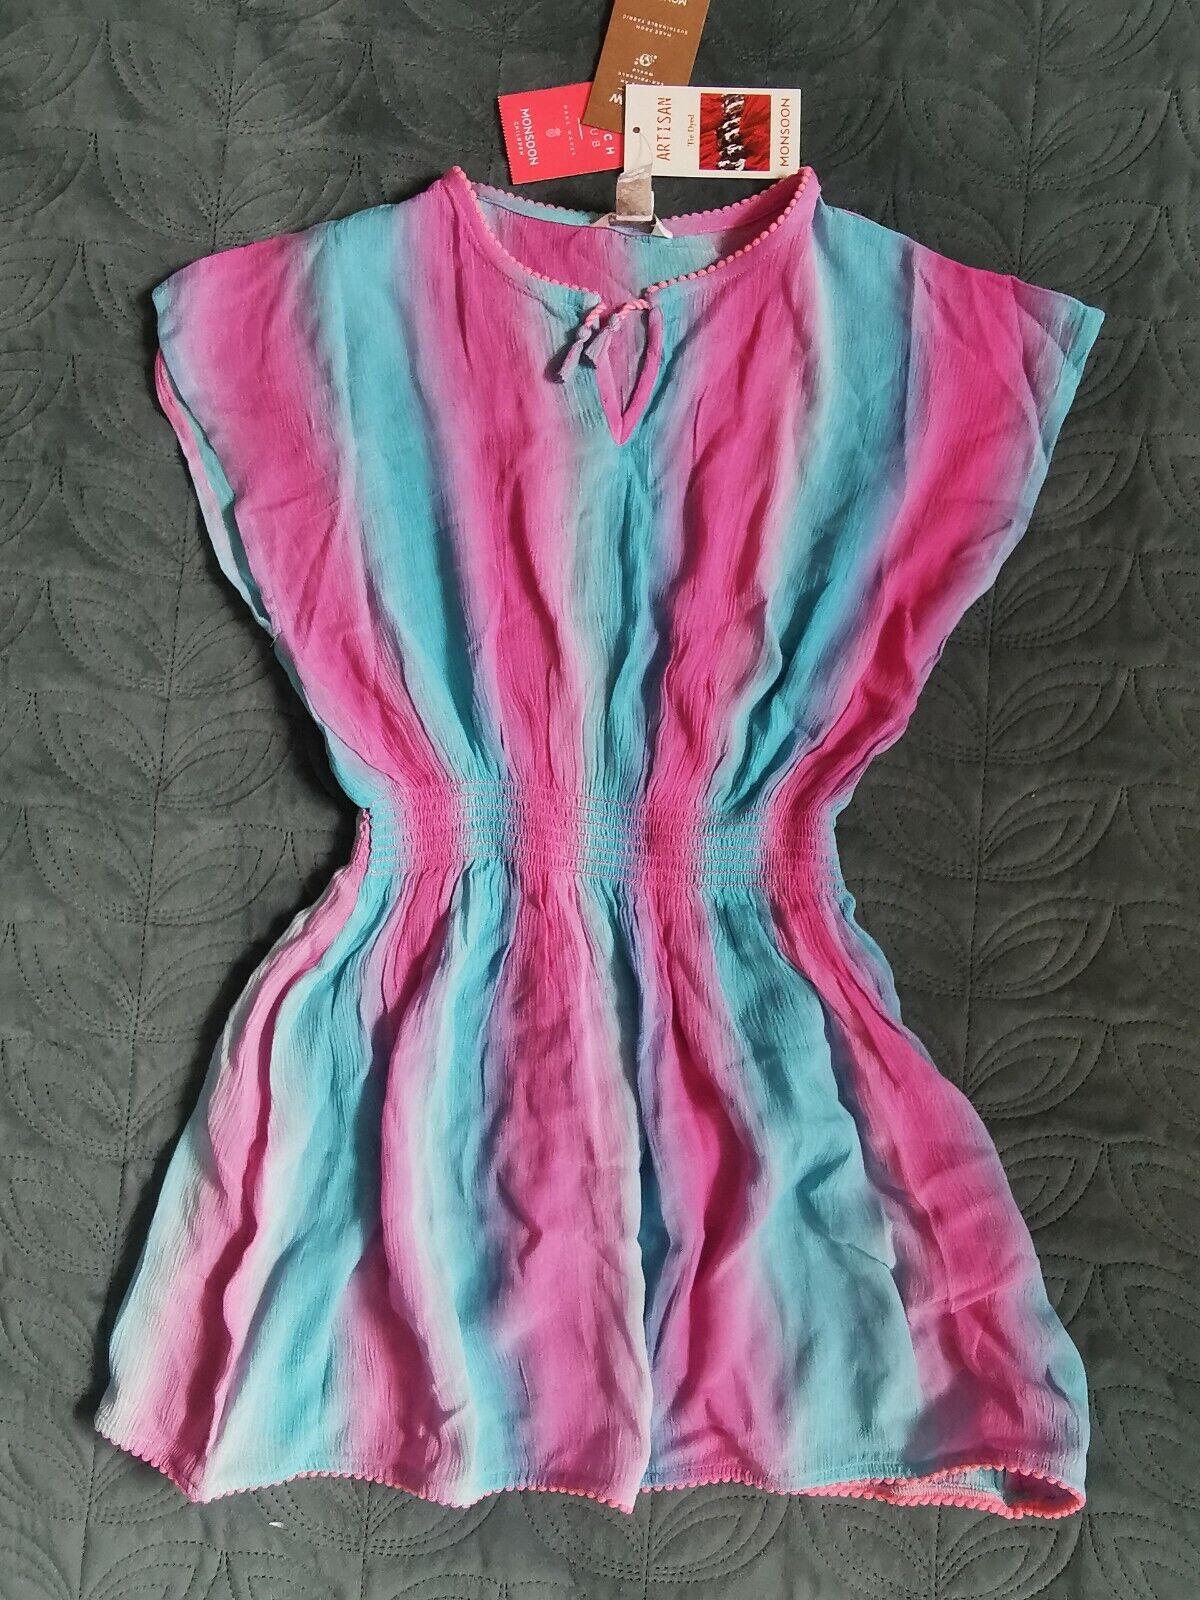 * 🏖️Monsoon Girl Kaftan Cover Up Dress 7-8 Pink Blue Ombre Tie Dyed swimwear